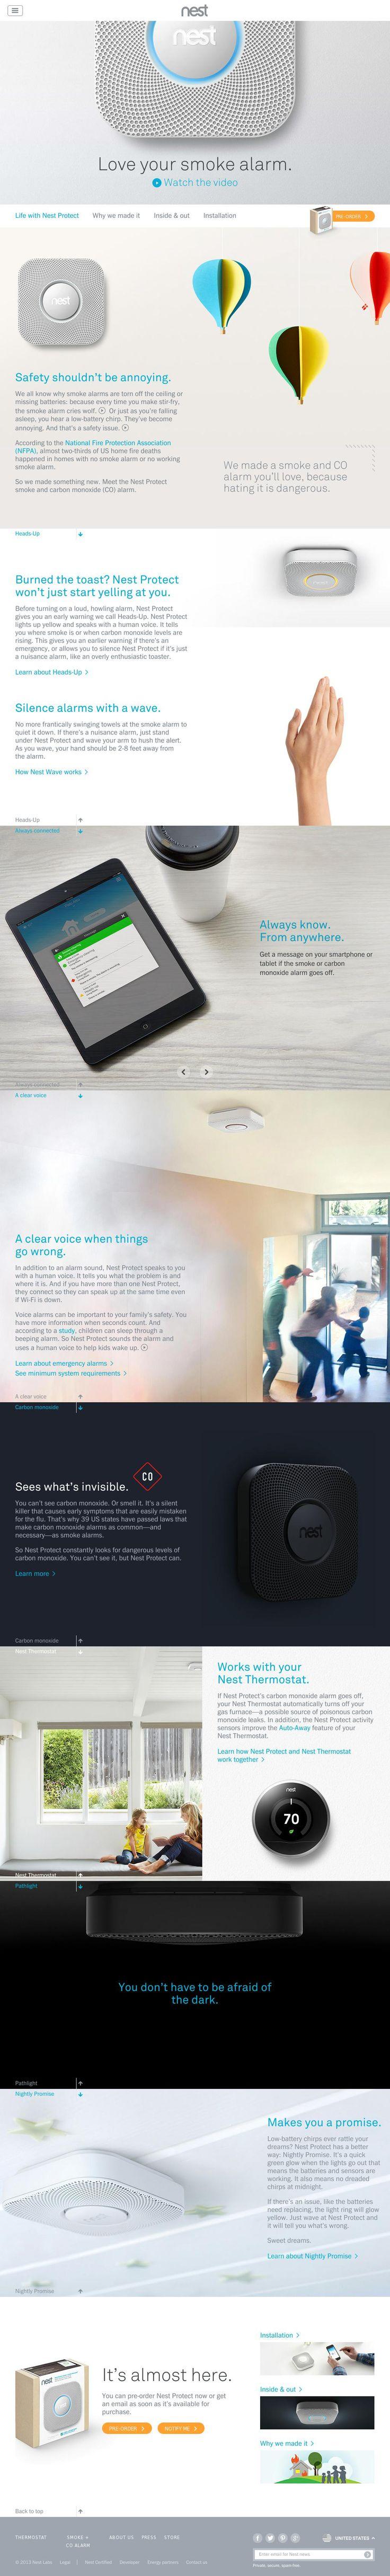 The website 'http://nest.com/smoke-co-alarm/life-with-nest-protect/' courtesy of @Pinstamatic (http://pinstamatic.com)